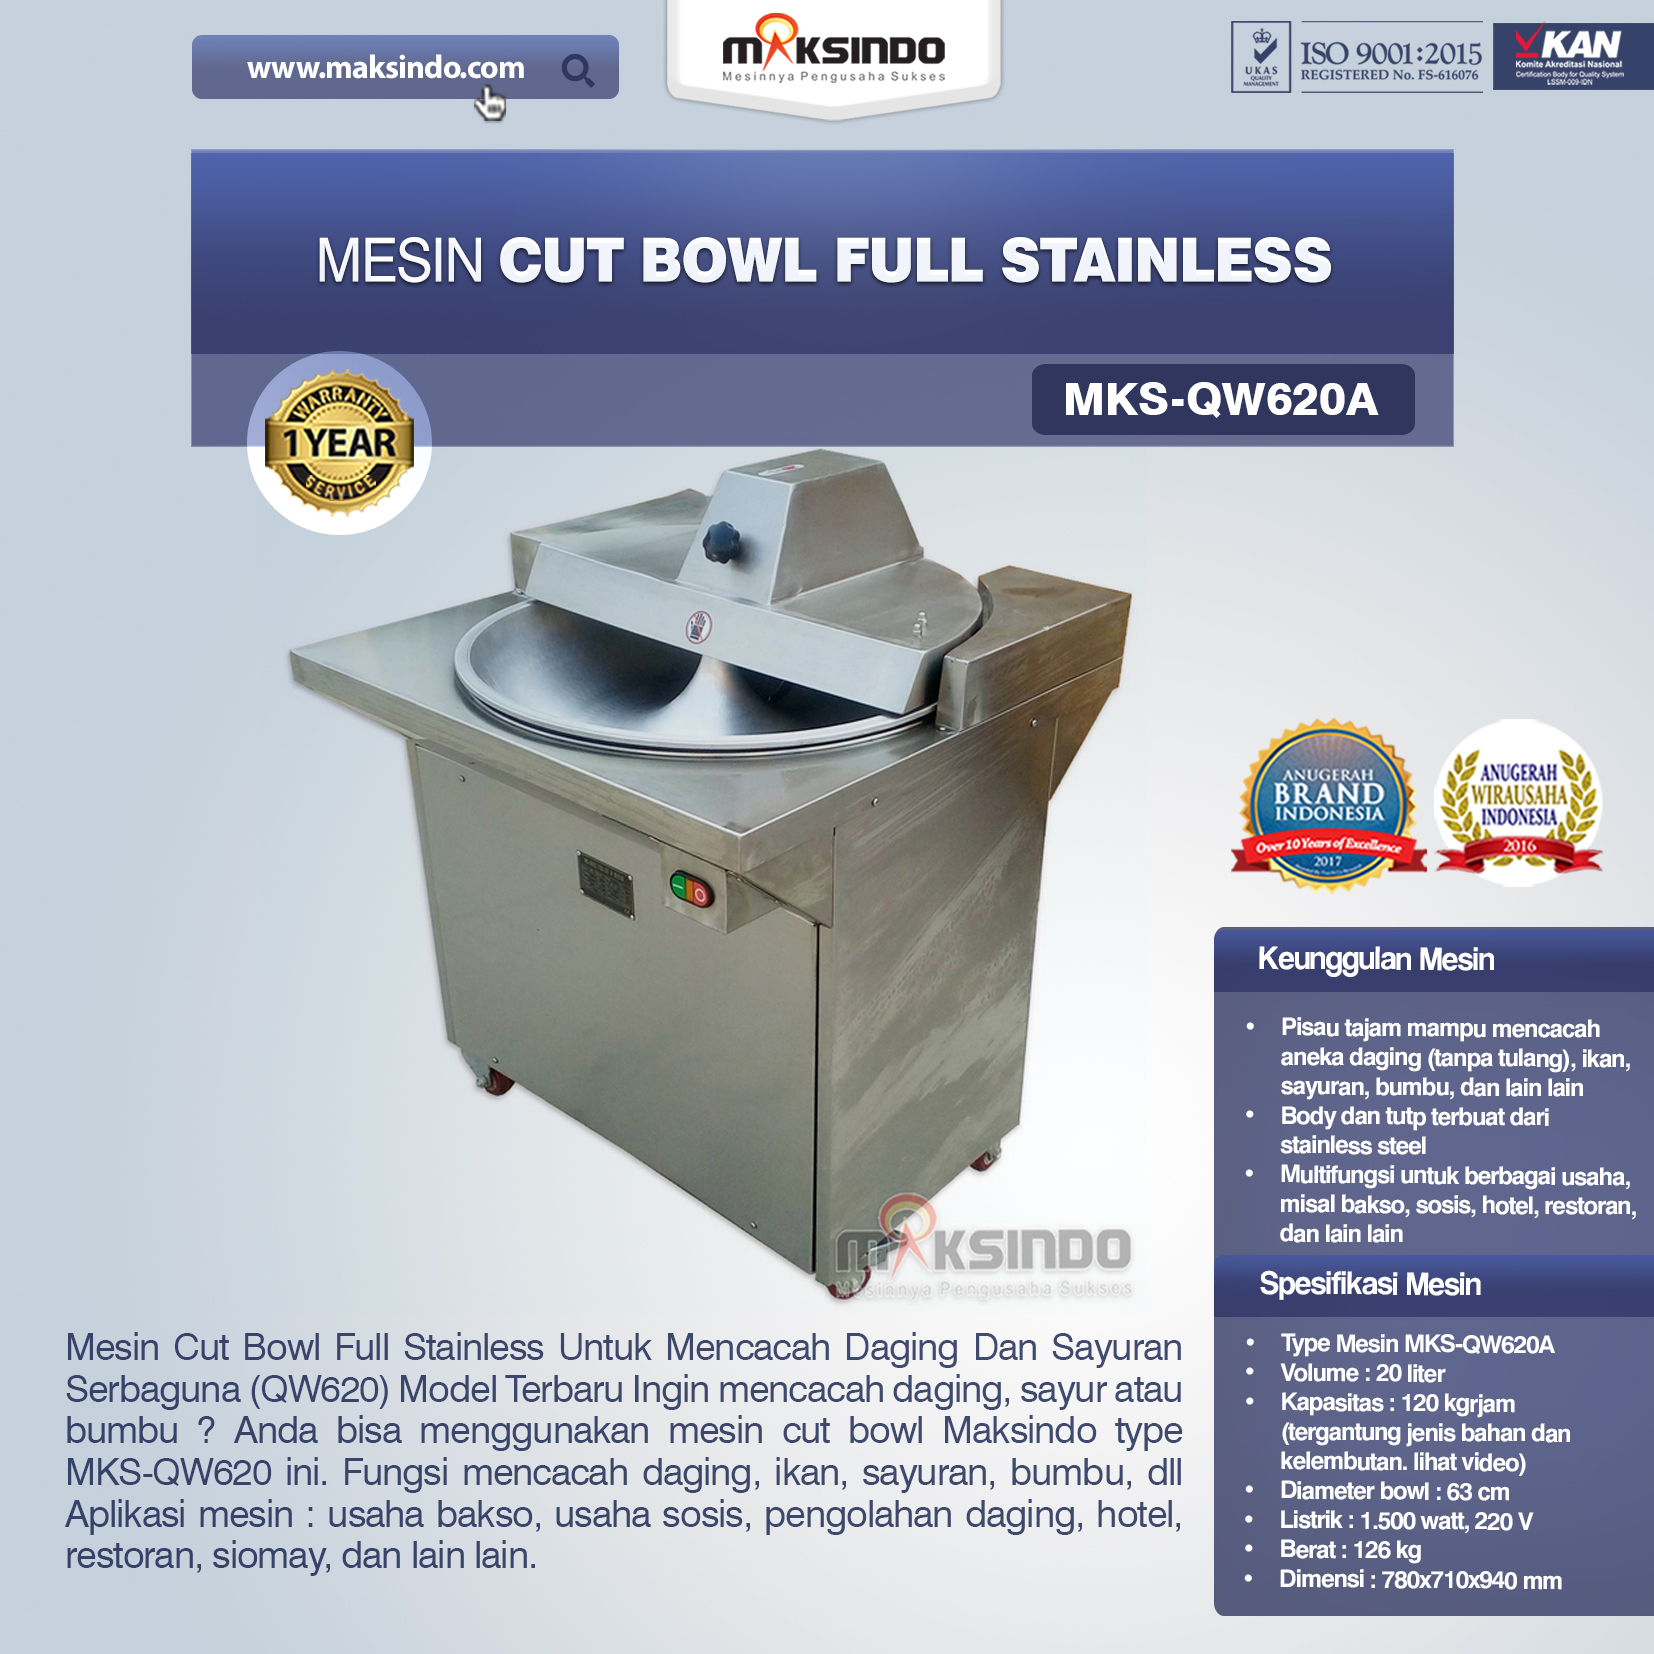 Jual Mesin Cut Bowl Full Stainless (QW620A) di Bandung